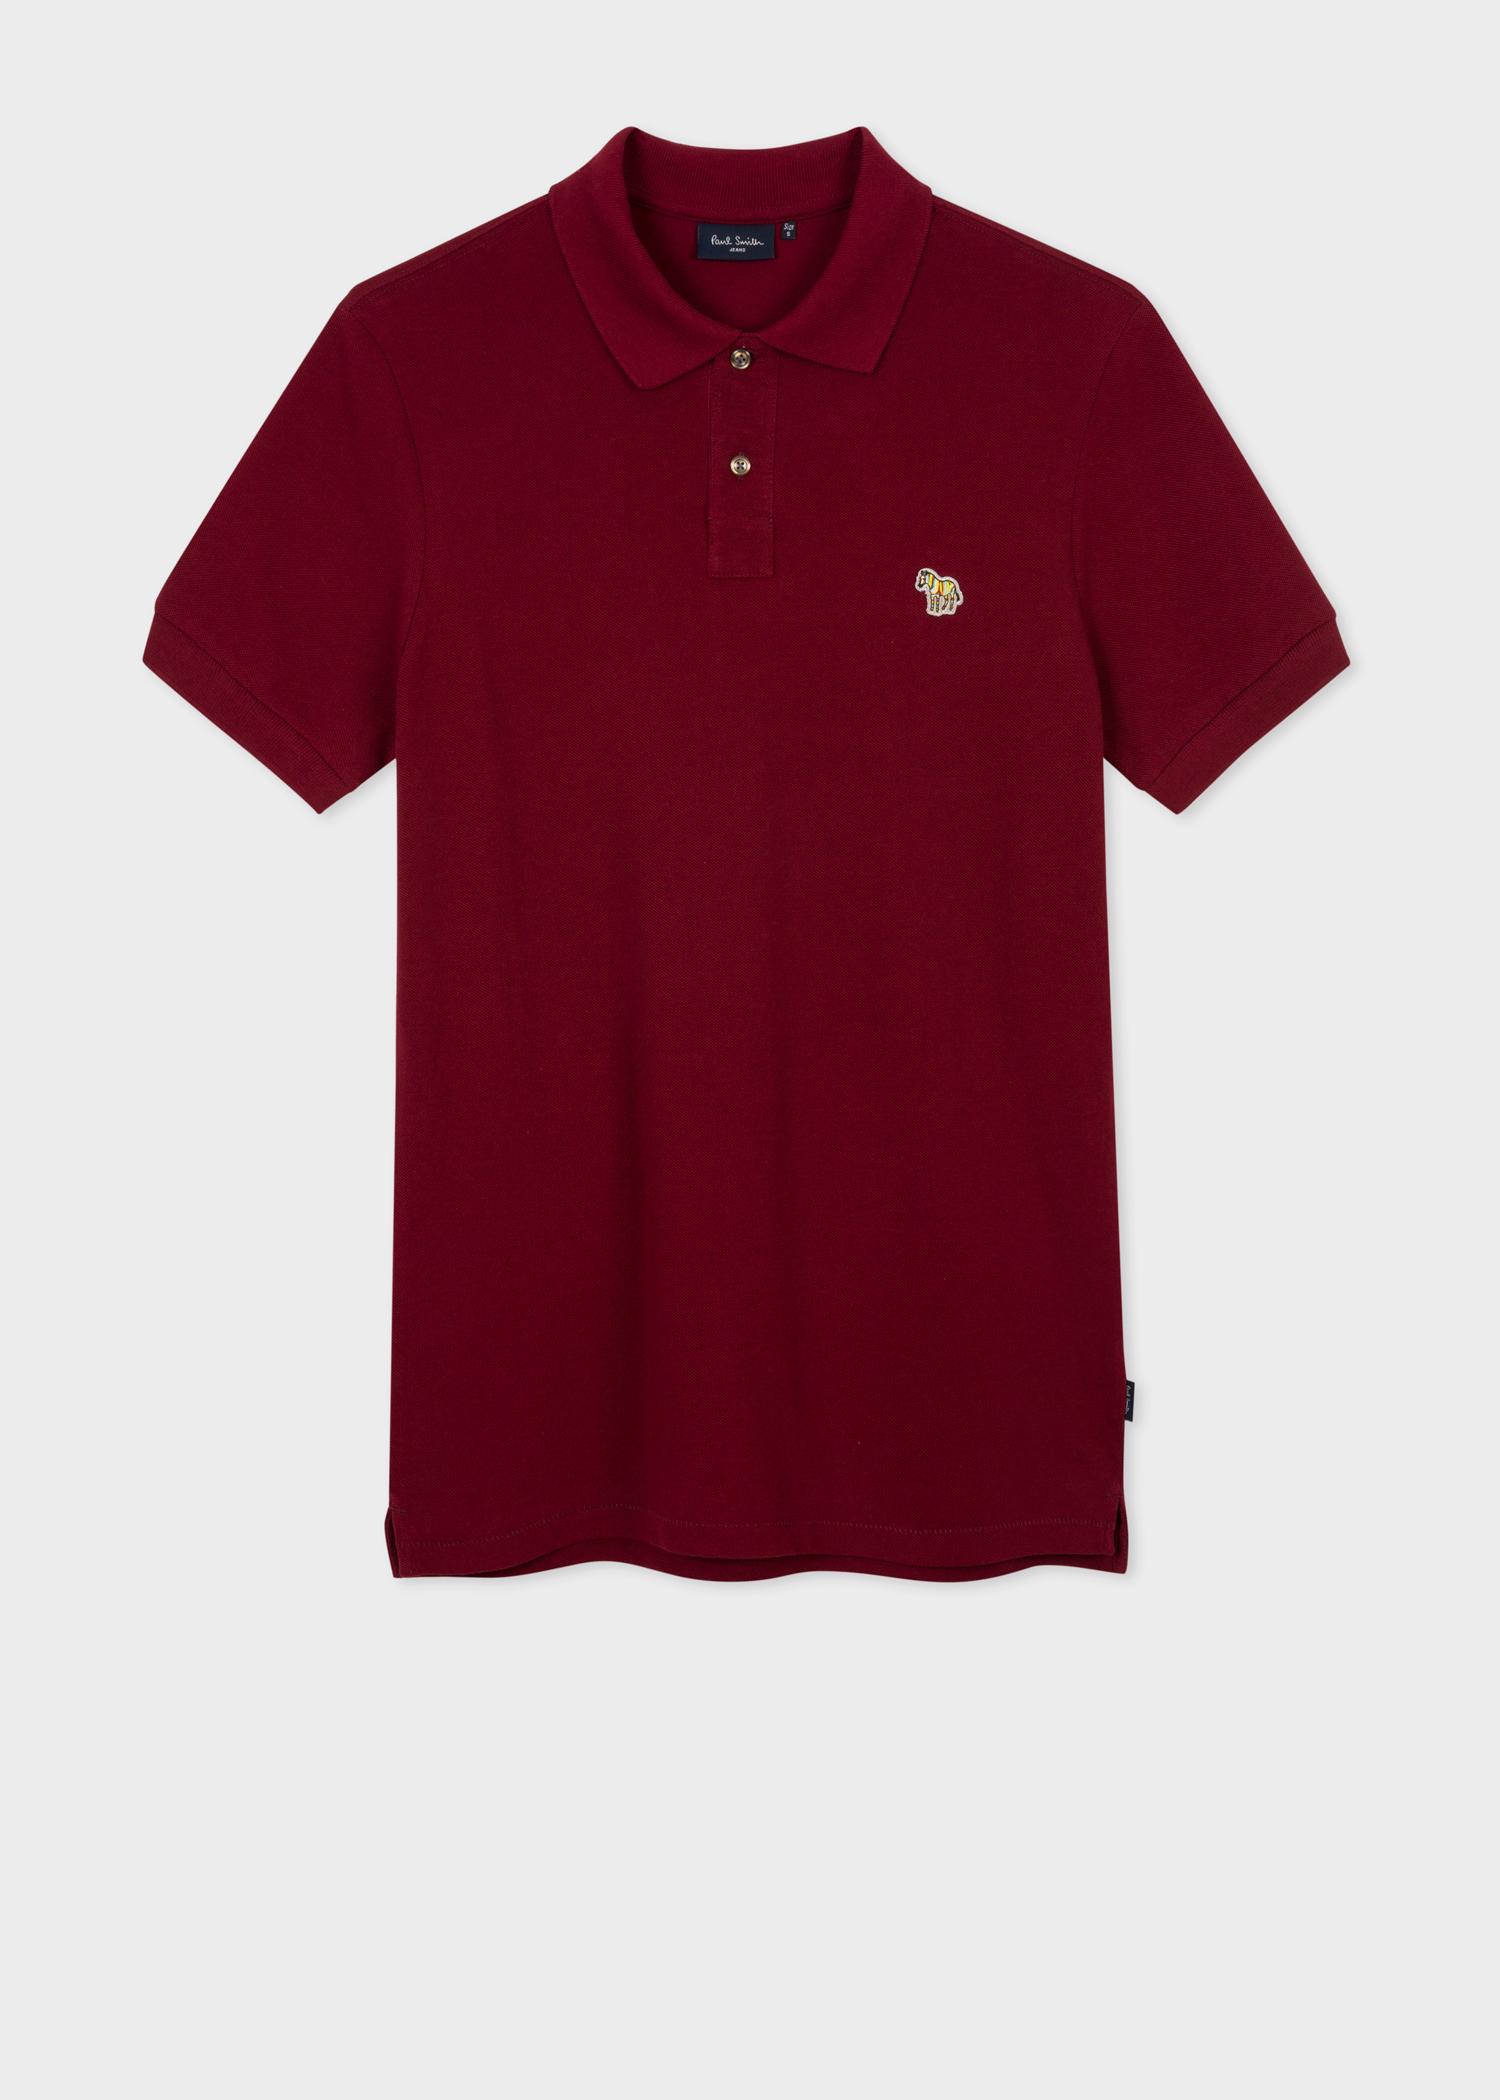 Mens Burgundy Zebra Logo Polo Shirt Paul Smith Us